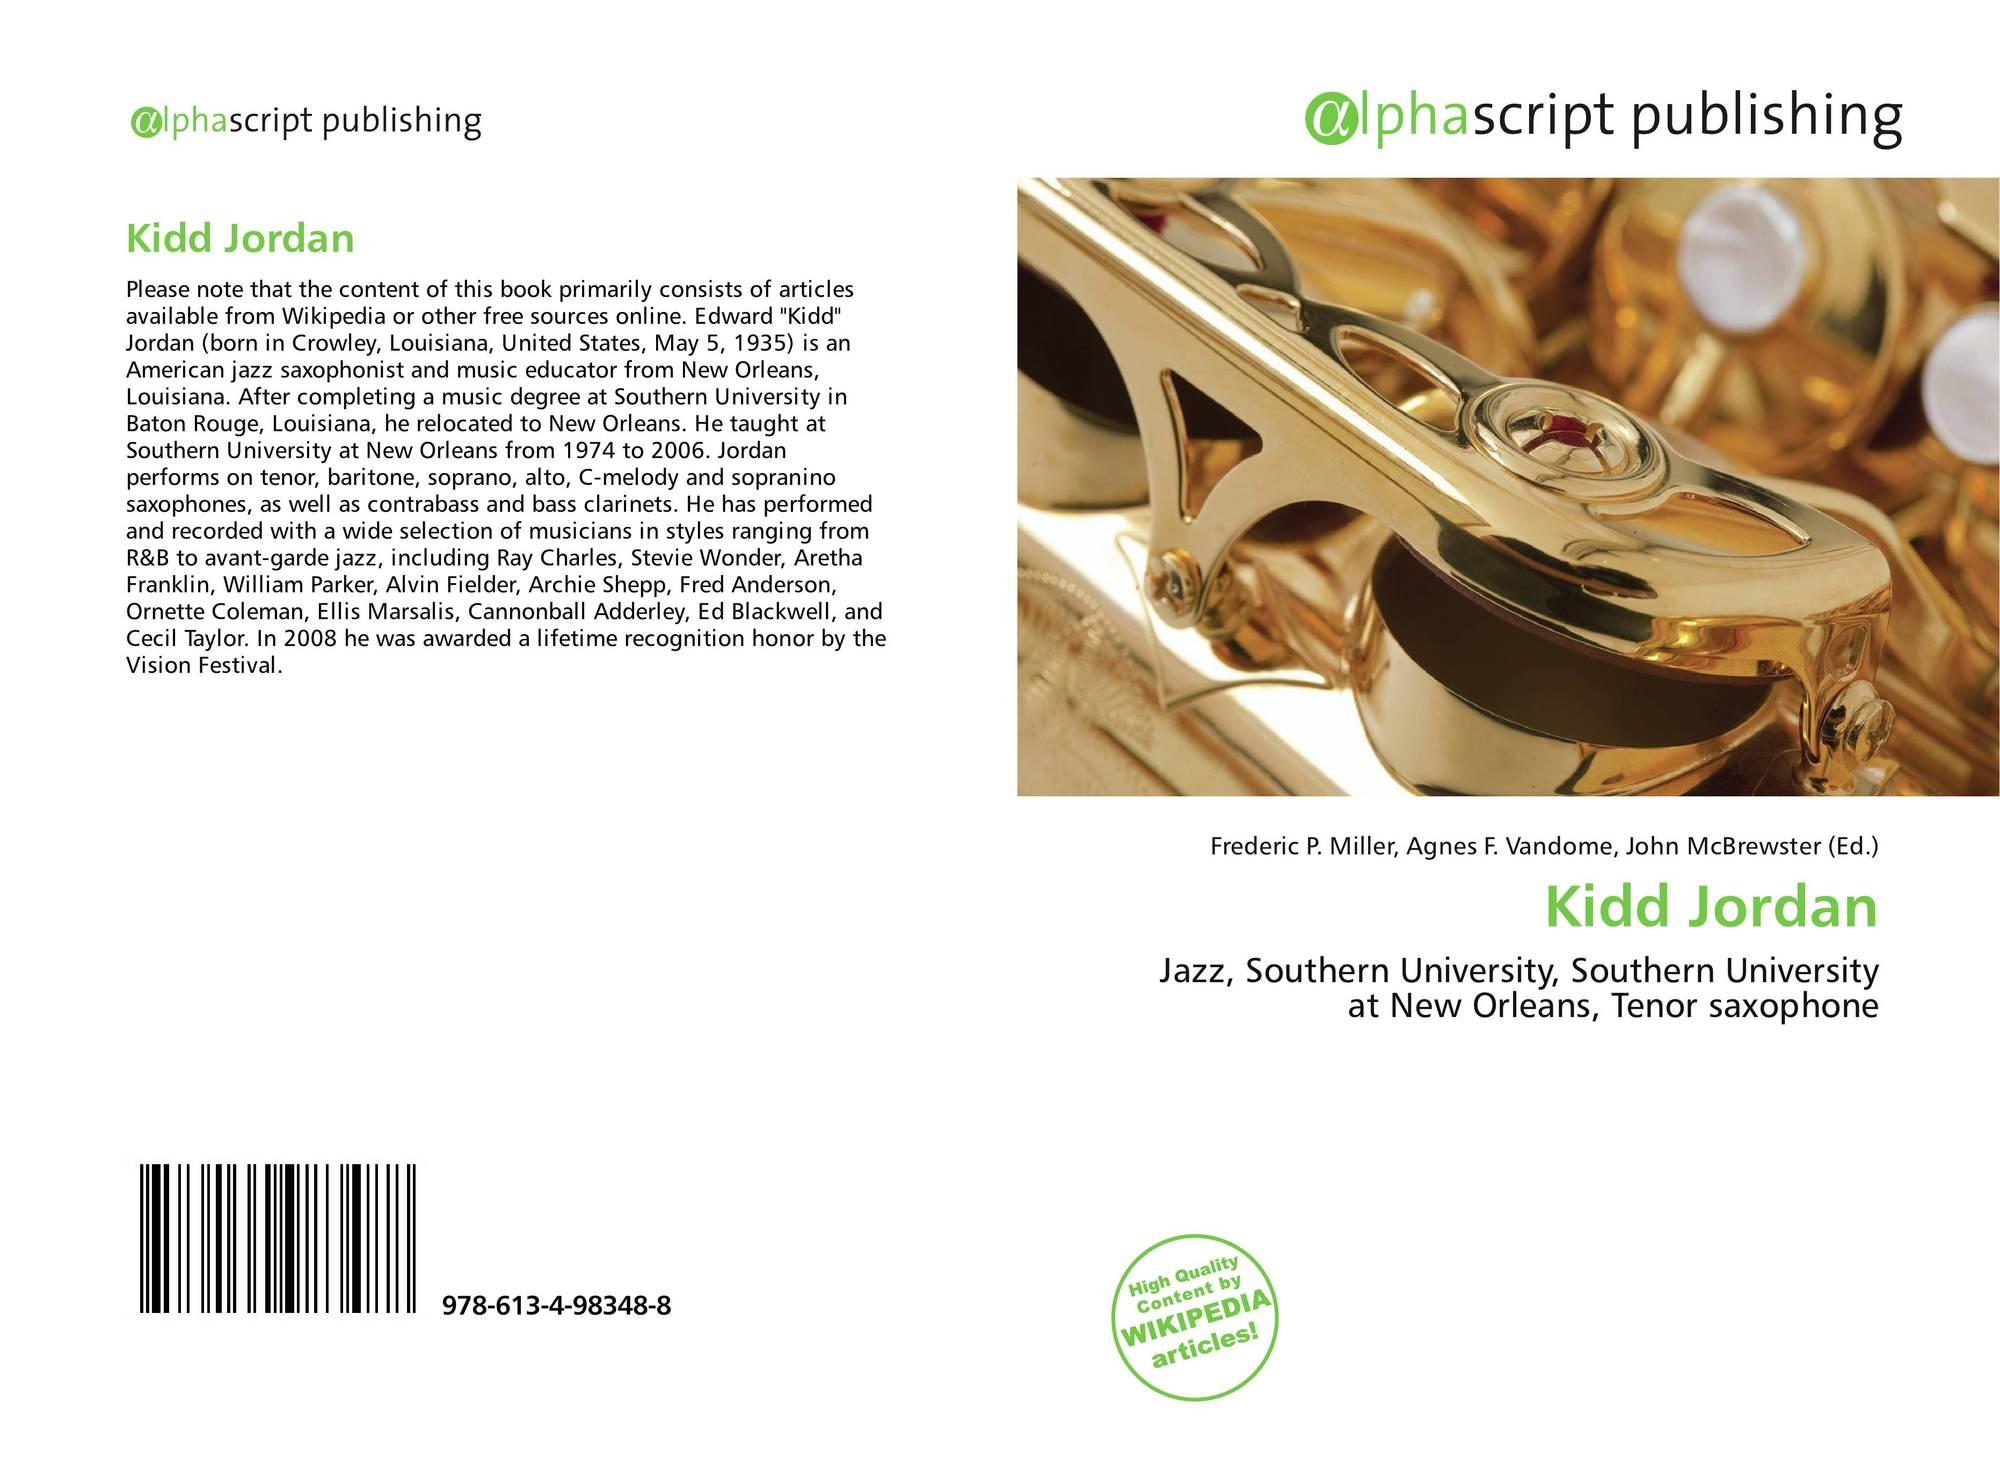 Kidd Jordan, 978-613-4-98348-8, 6134983489 ,9786134983488